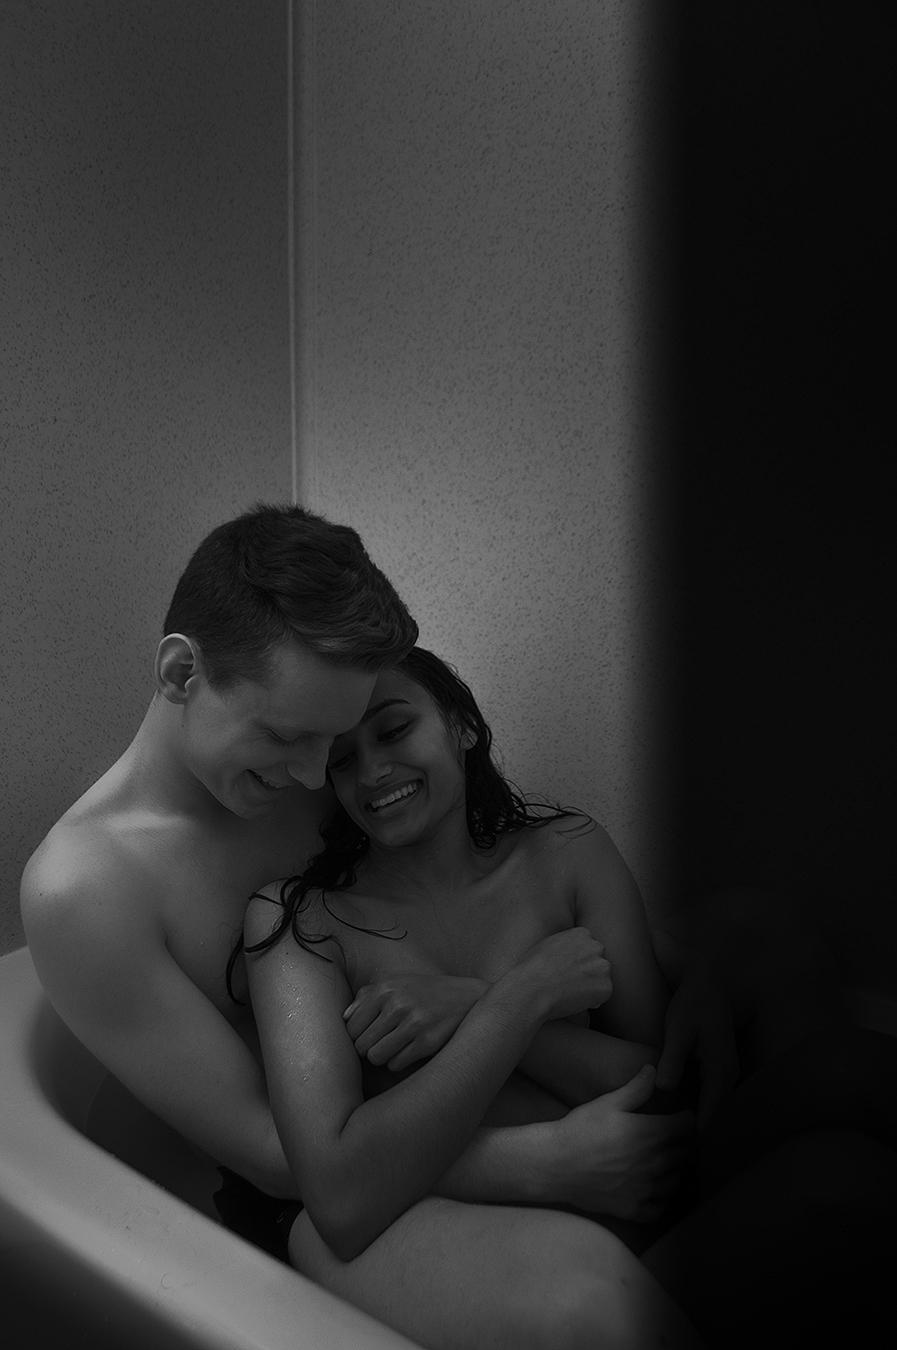 Noel_Zheng_photography_student_upenn_university_of_pennsylvania_Tony_Ward_Studio_Isuru_Amarasekera_Thomas_Calder_black_white_war_emotion_happiness_love_sex_bath_bathtub_wet